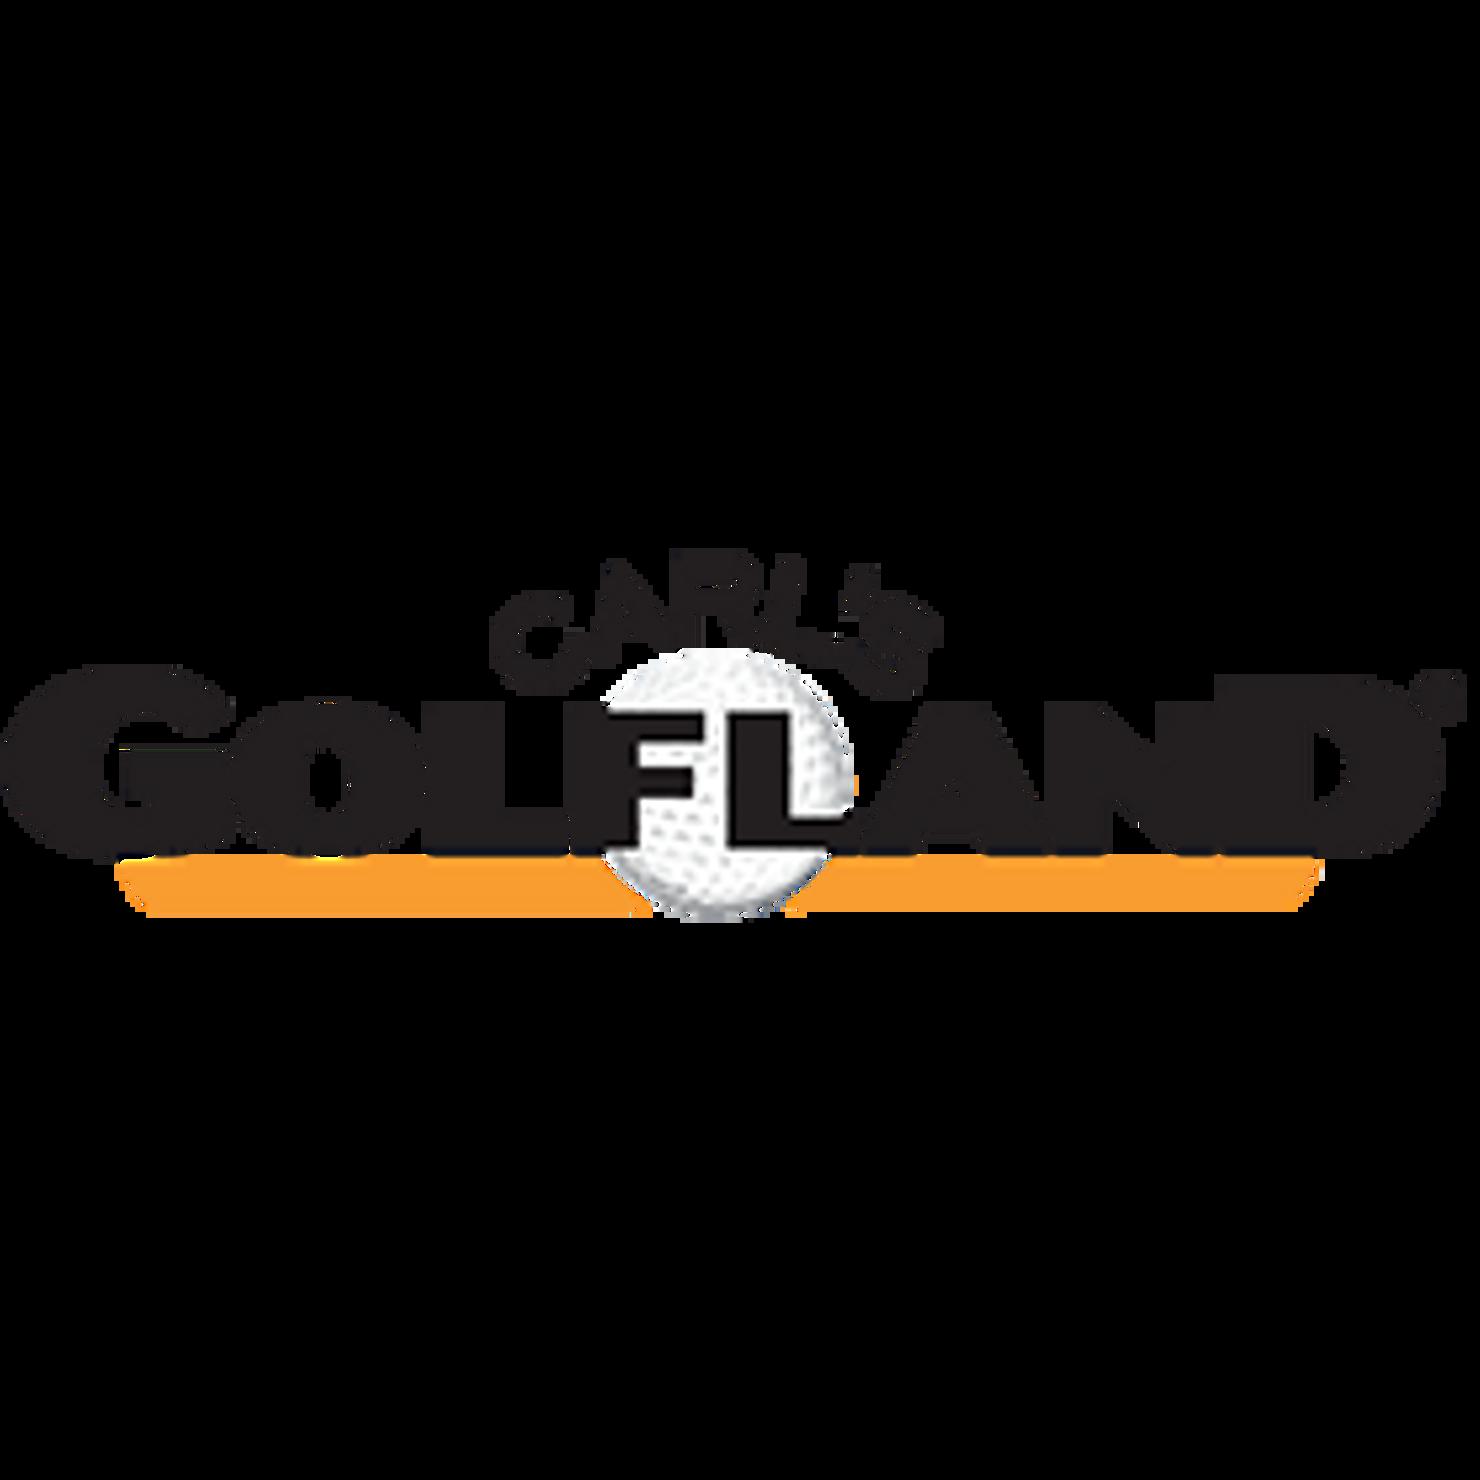 Adidas Climacool Chino Print Hat ON SALE - Carl s Golfland 2304d3db8baf